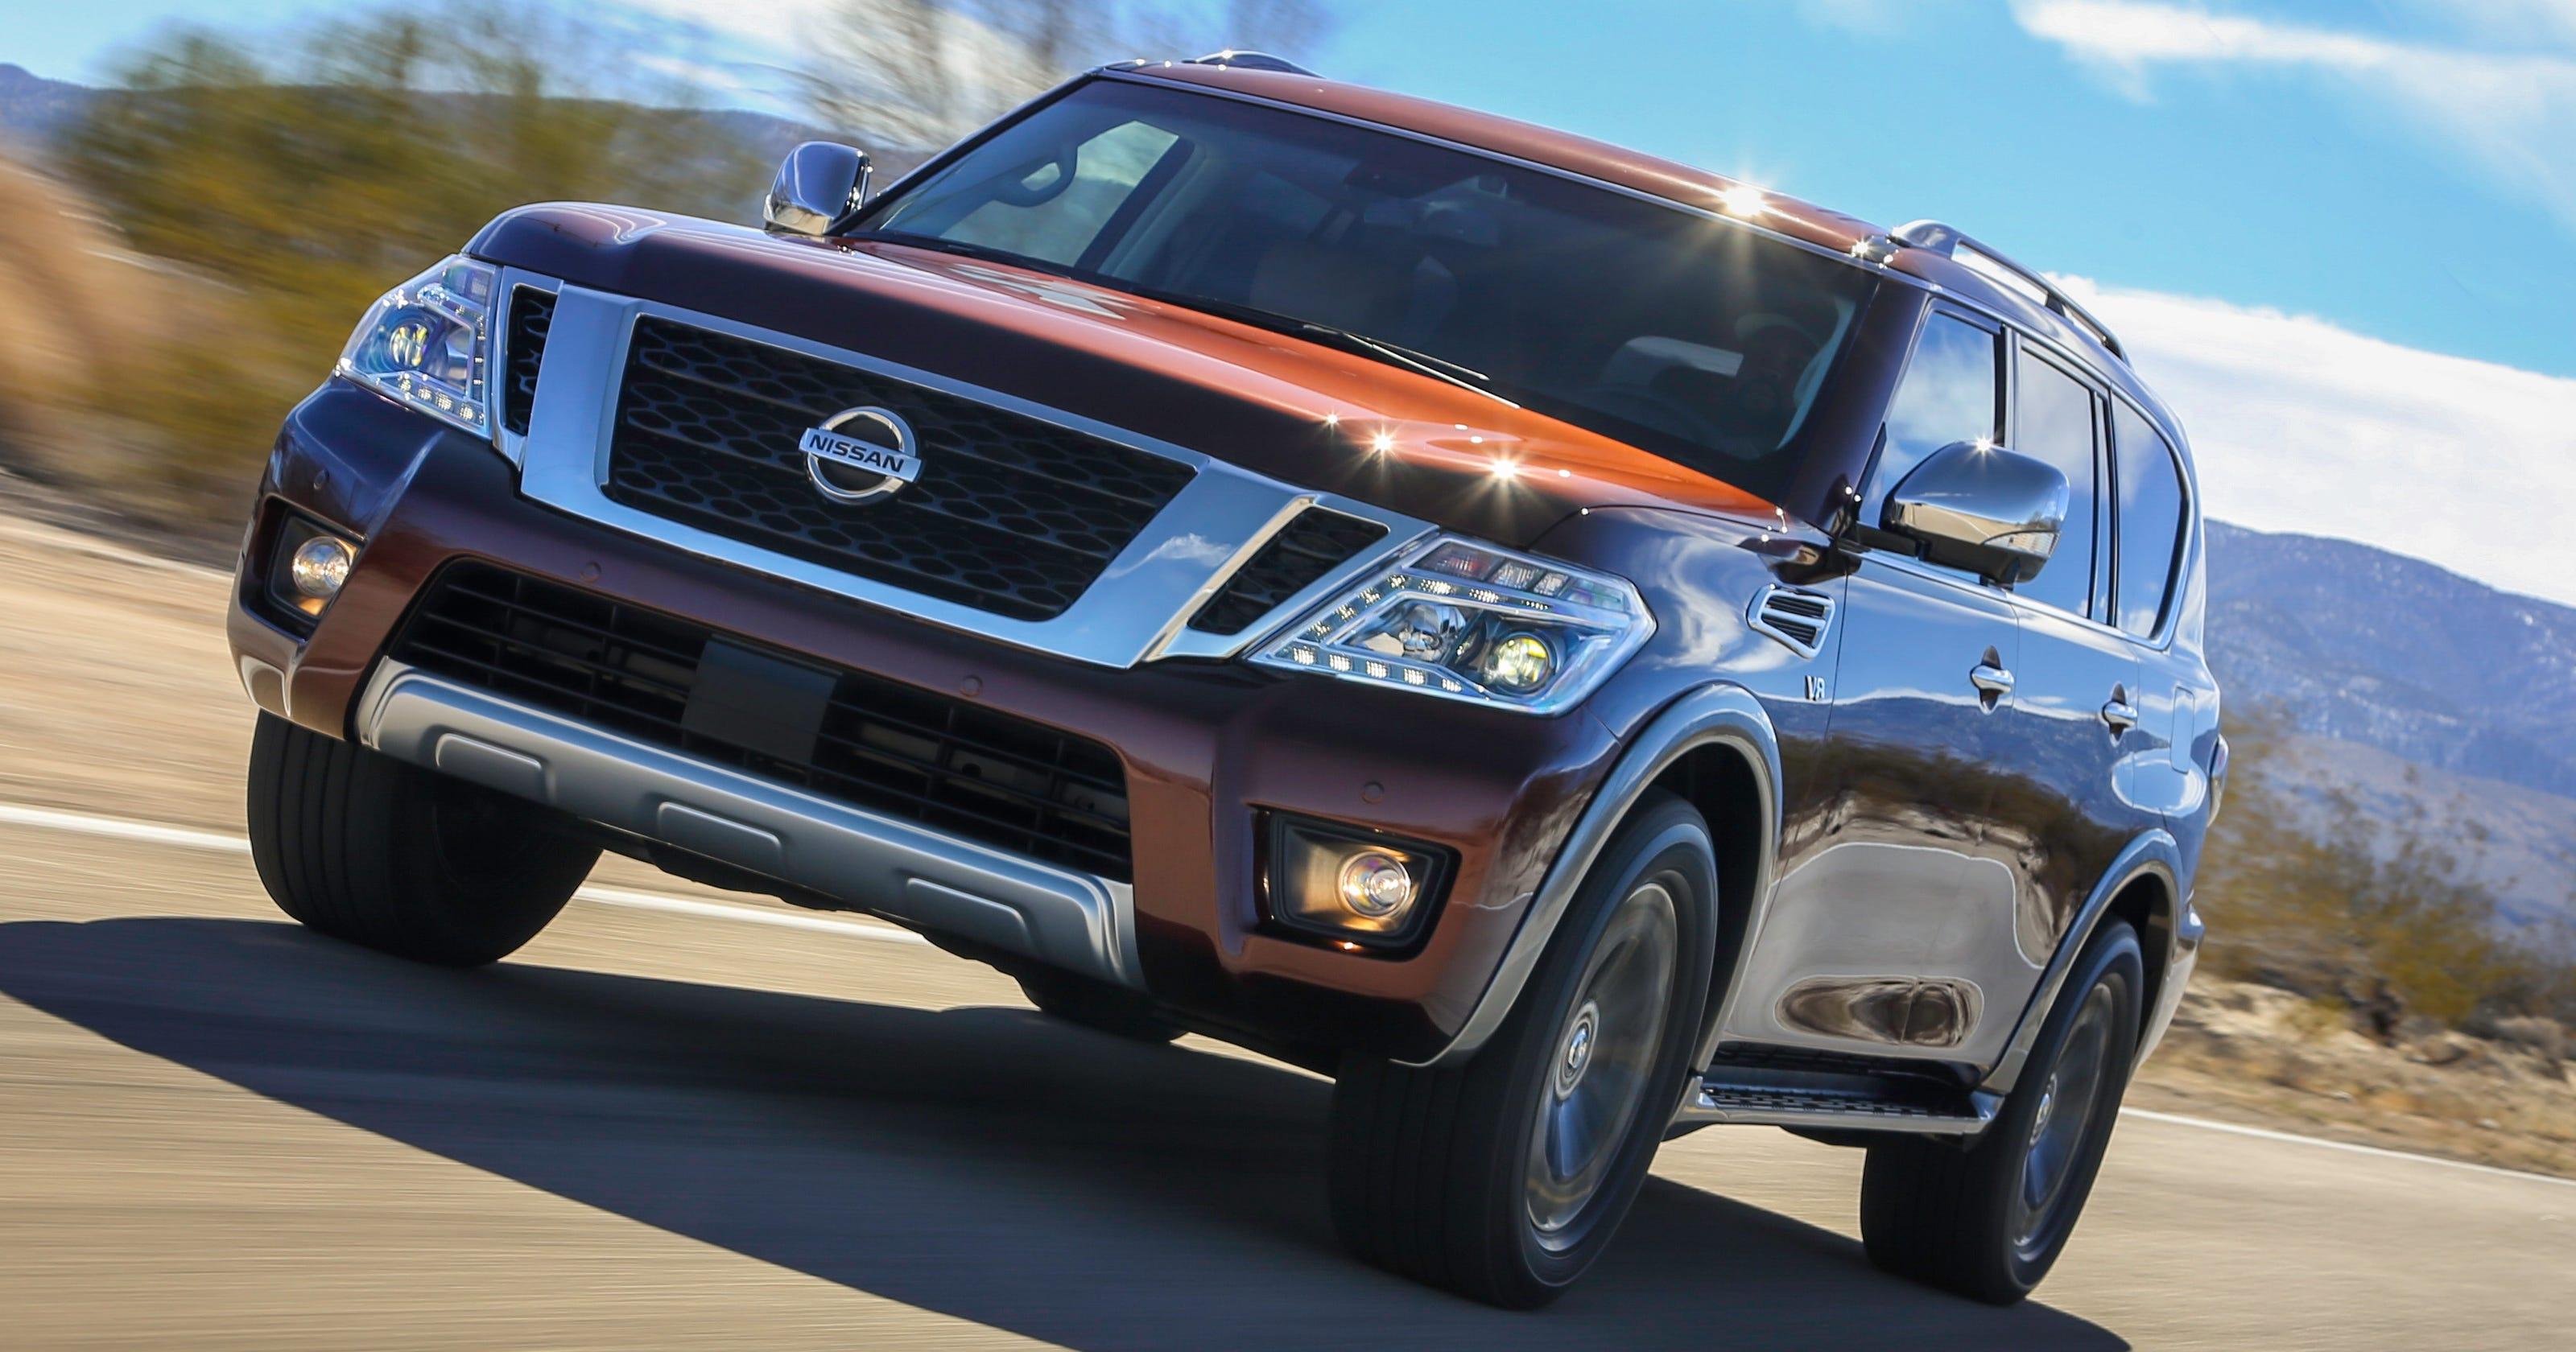 Review: Nissan Armada rocks the SUV fleet